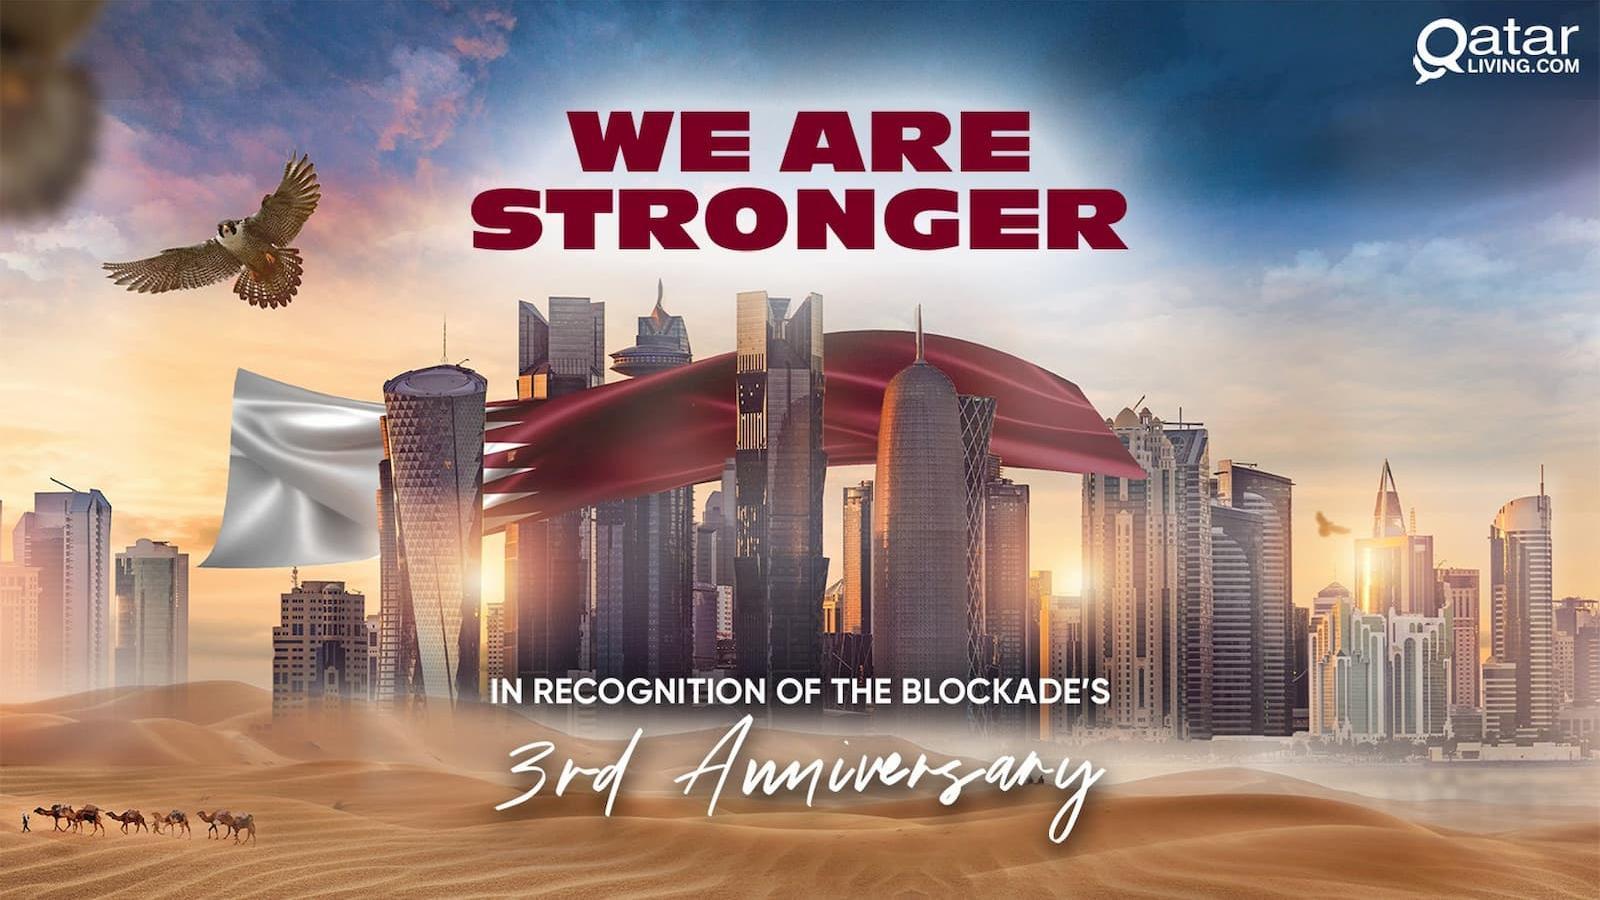 WATCH: Blockade - three years on, Qatar marches forward with dignity, self-reliance